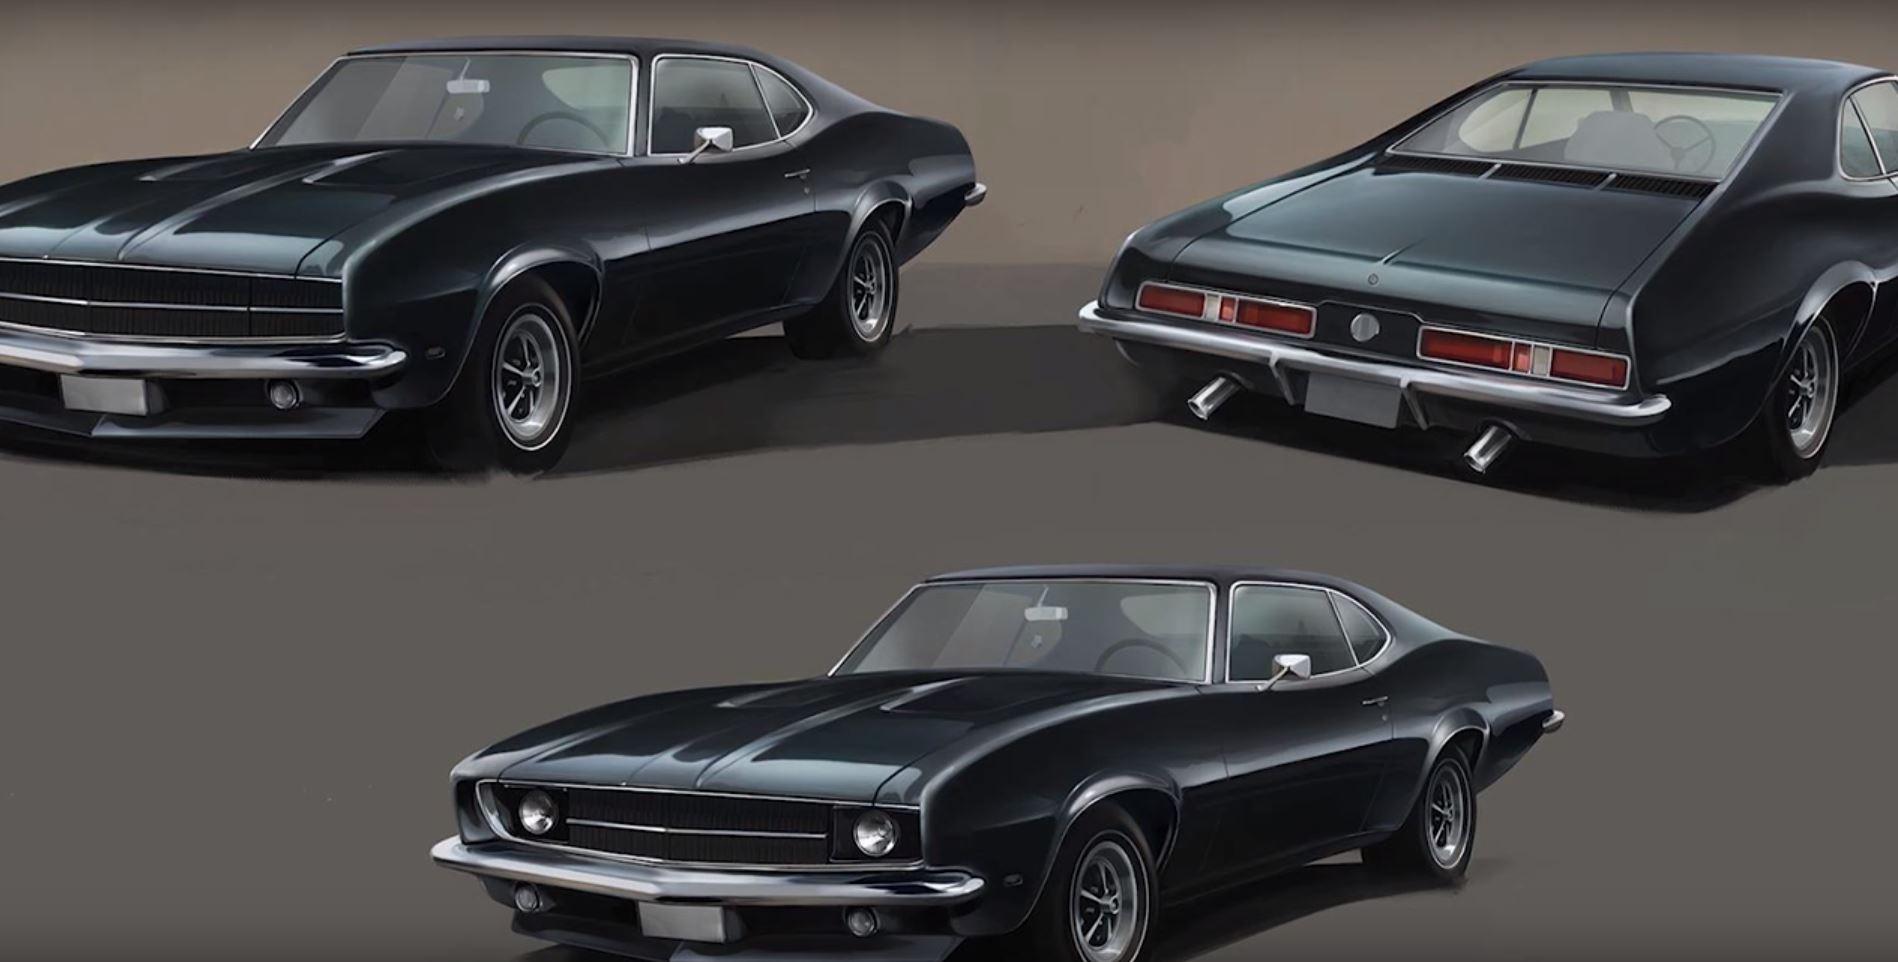 mafia 3 alle autos und ihre fahrzeug modifikationen. Black Bedroom Furniture Sets. Home Design Ideas